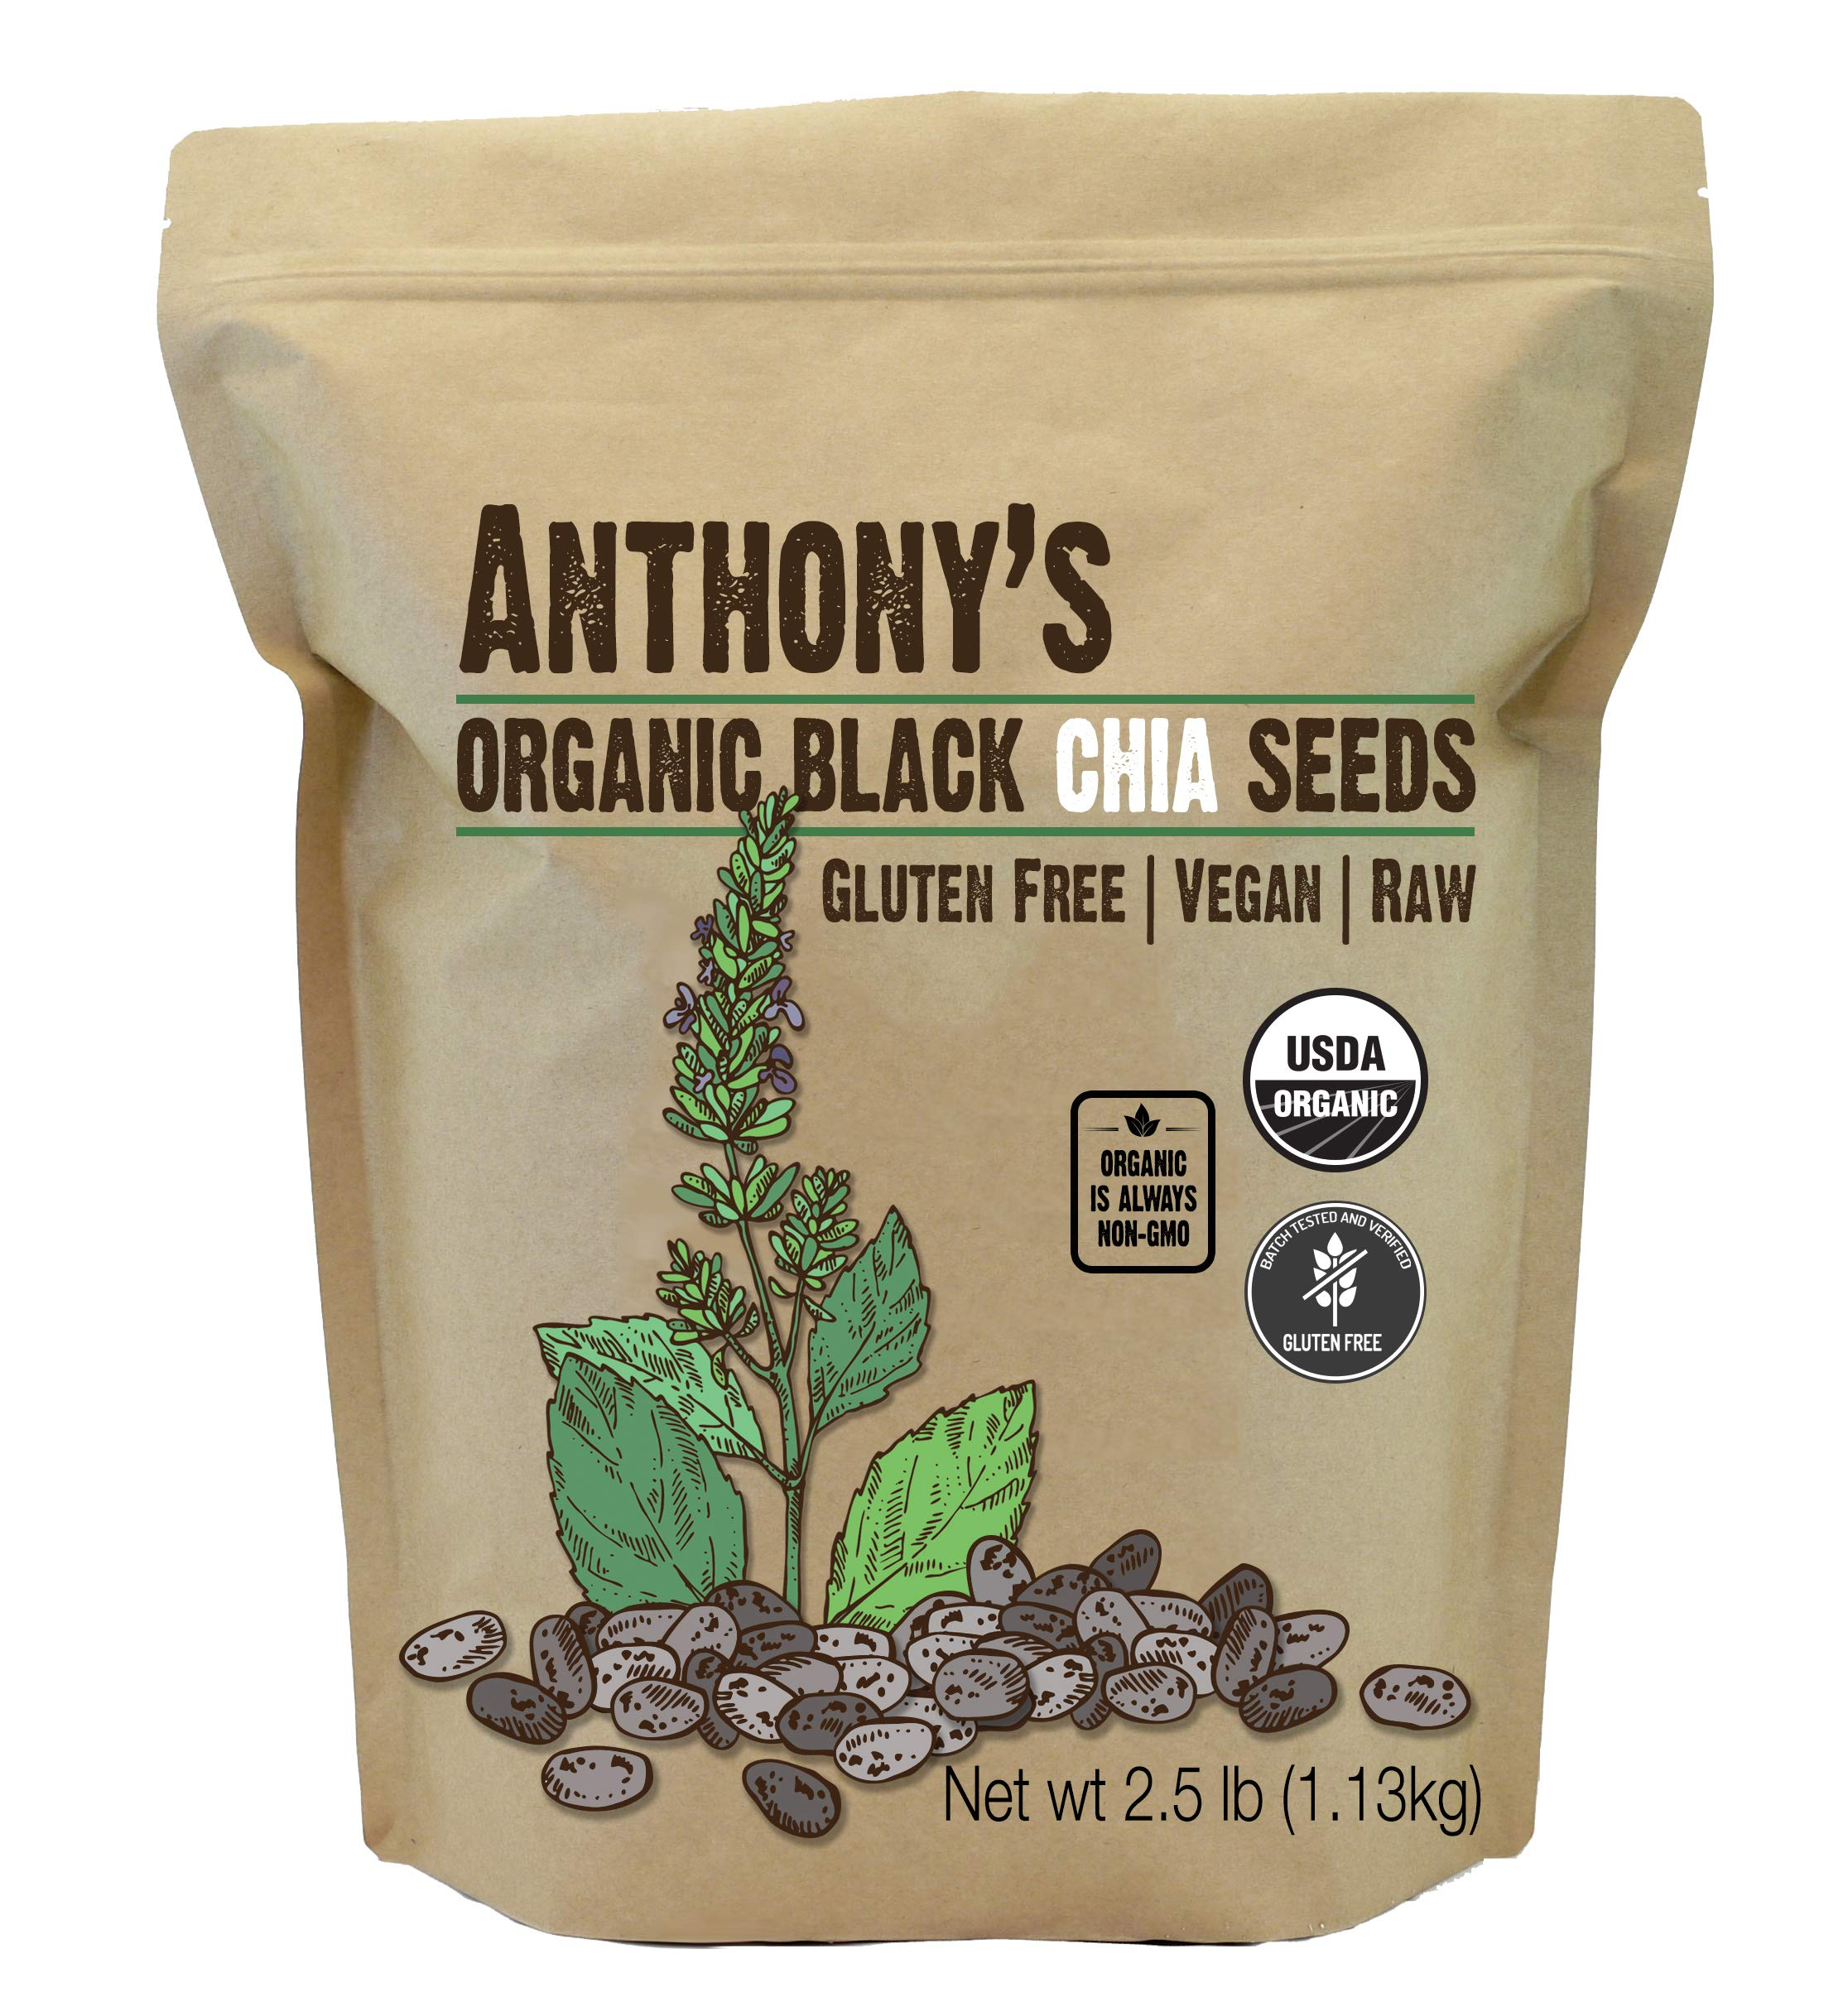 Anthony's Organic Chia Seed, 2.5lbs, Gluten Free, Vegan, Raw, Keto Friendly by Anthony's